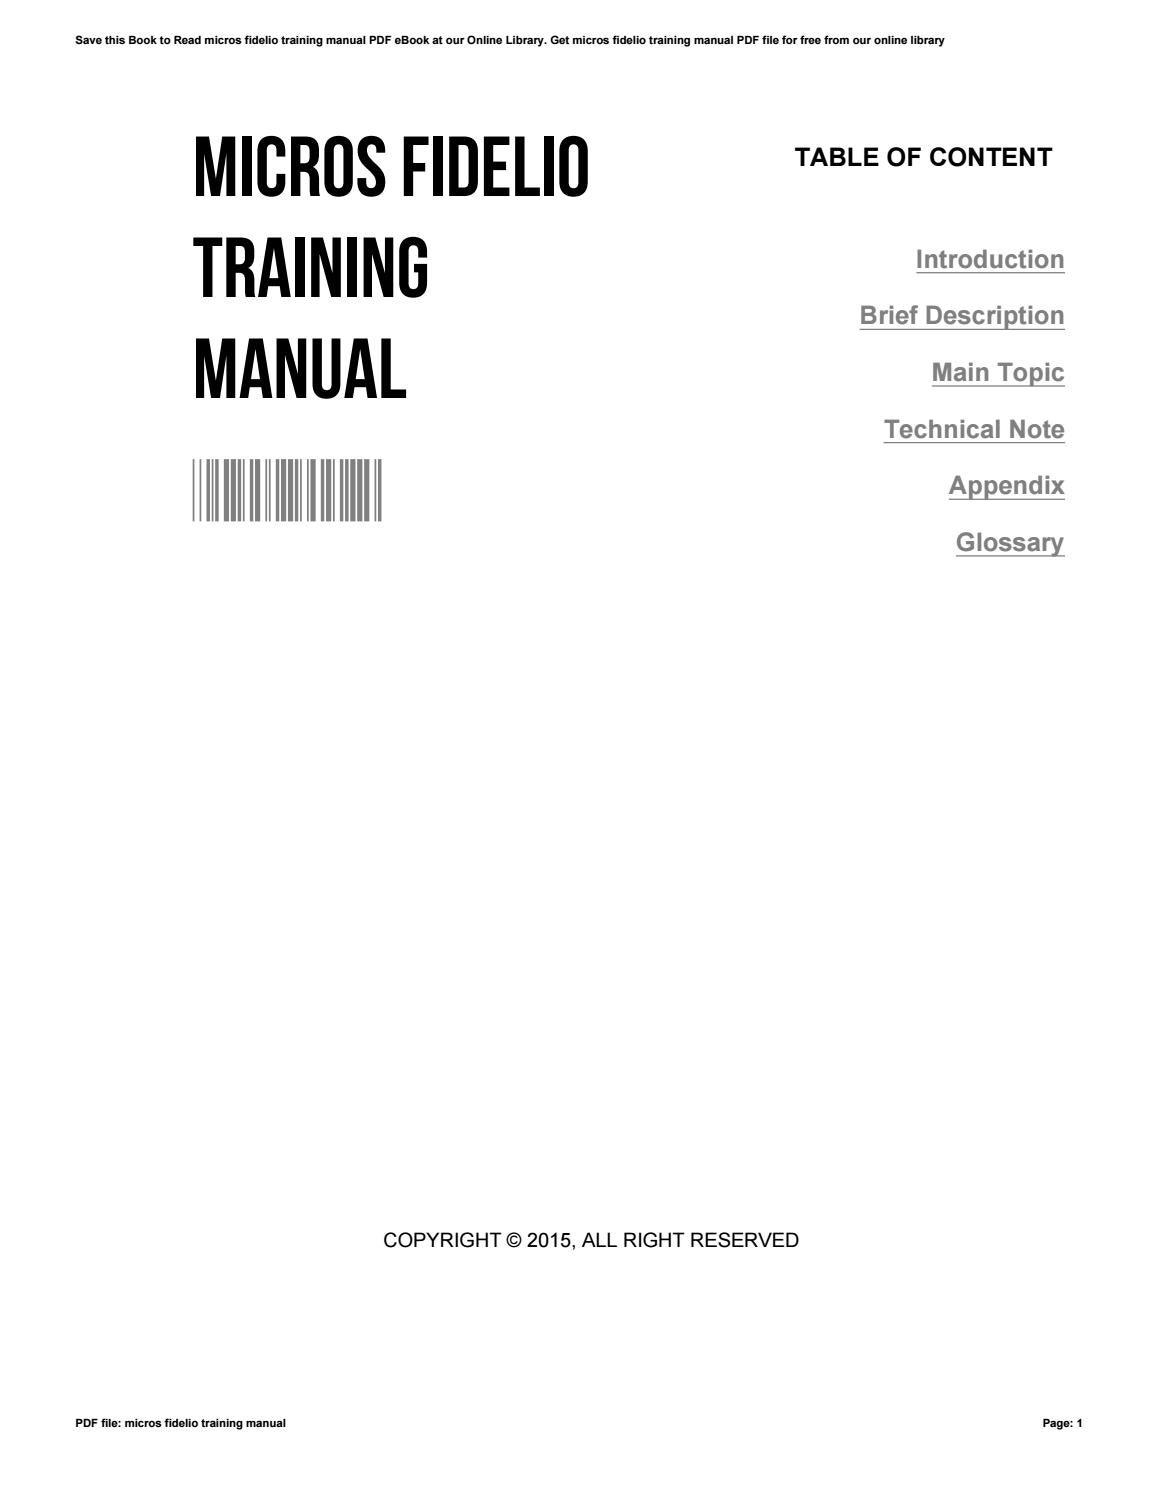 micros simphony training manual pdf